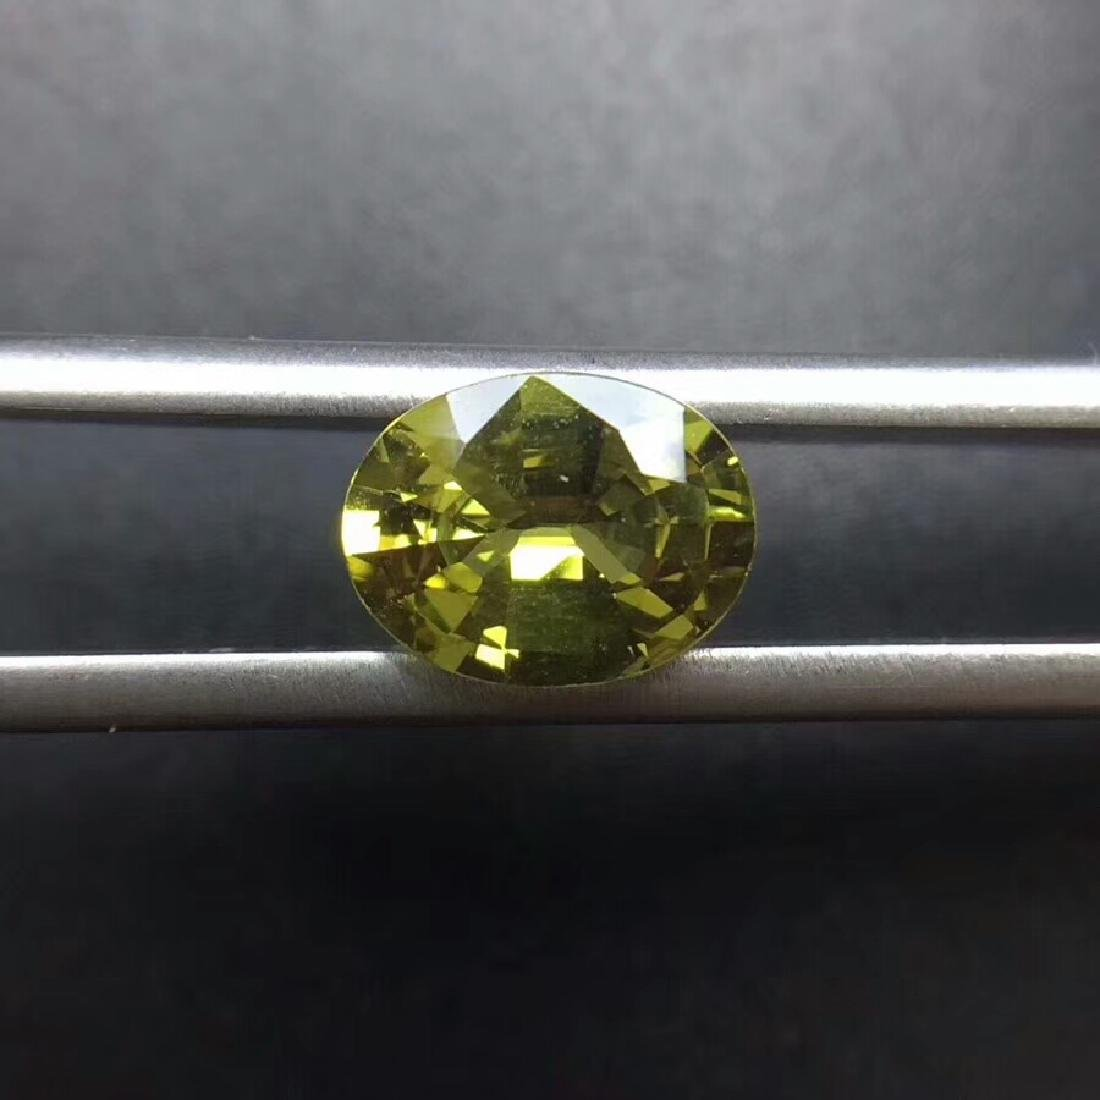 1.75 ct Chrysoberyl 8.8*6.7*4.0 mm Oval Cut